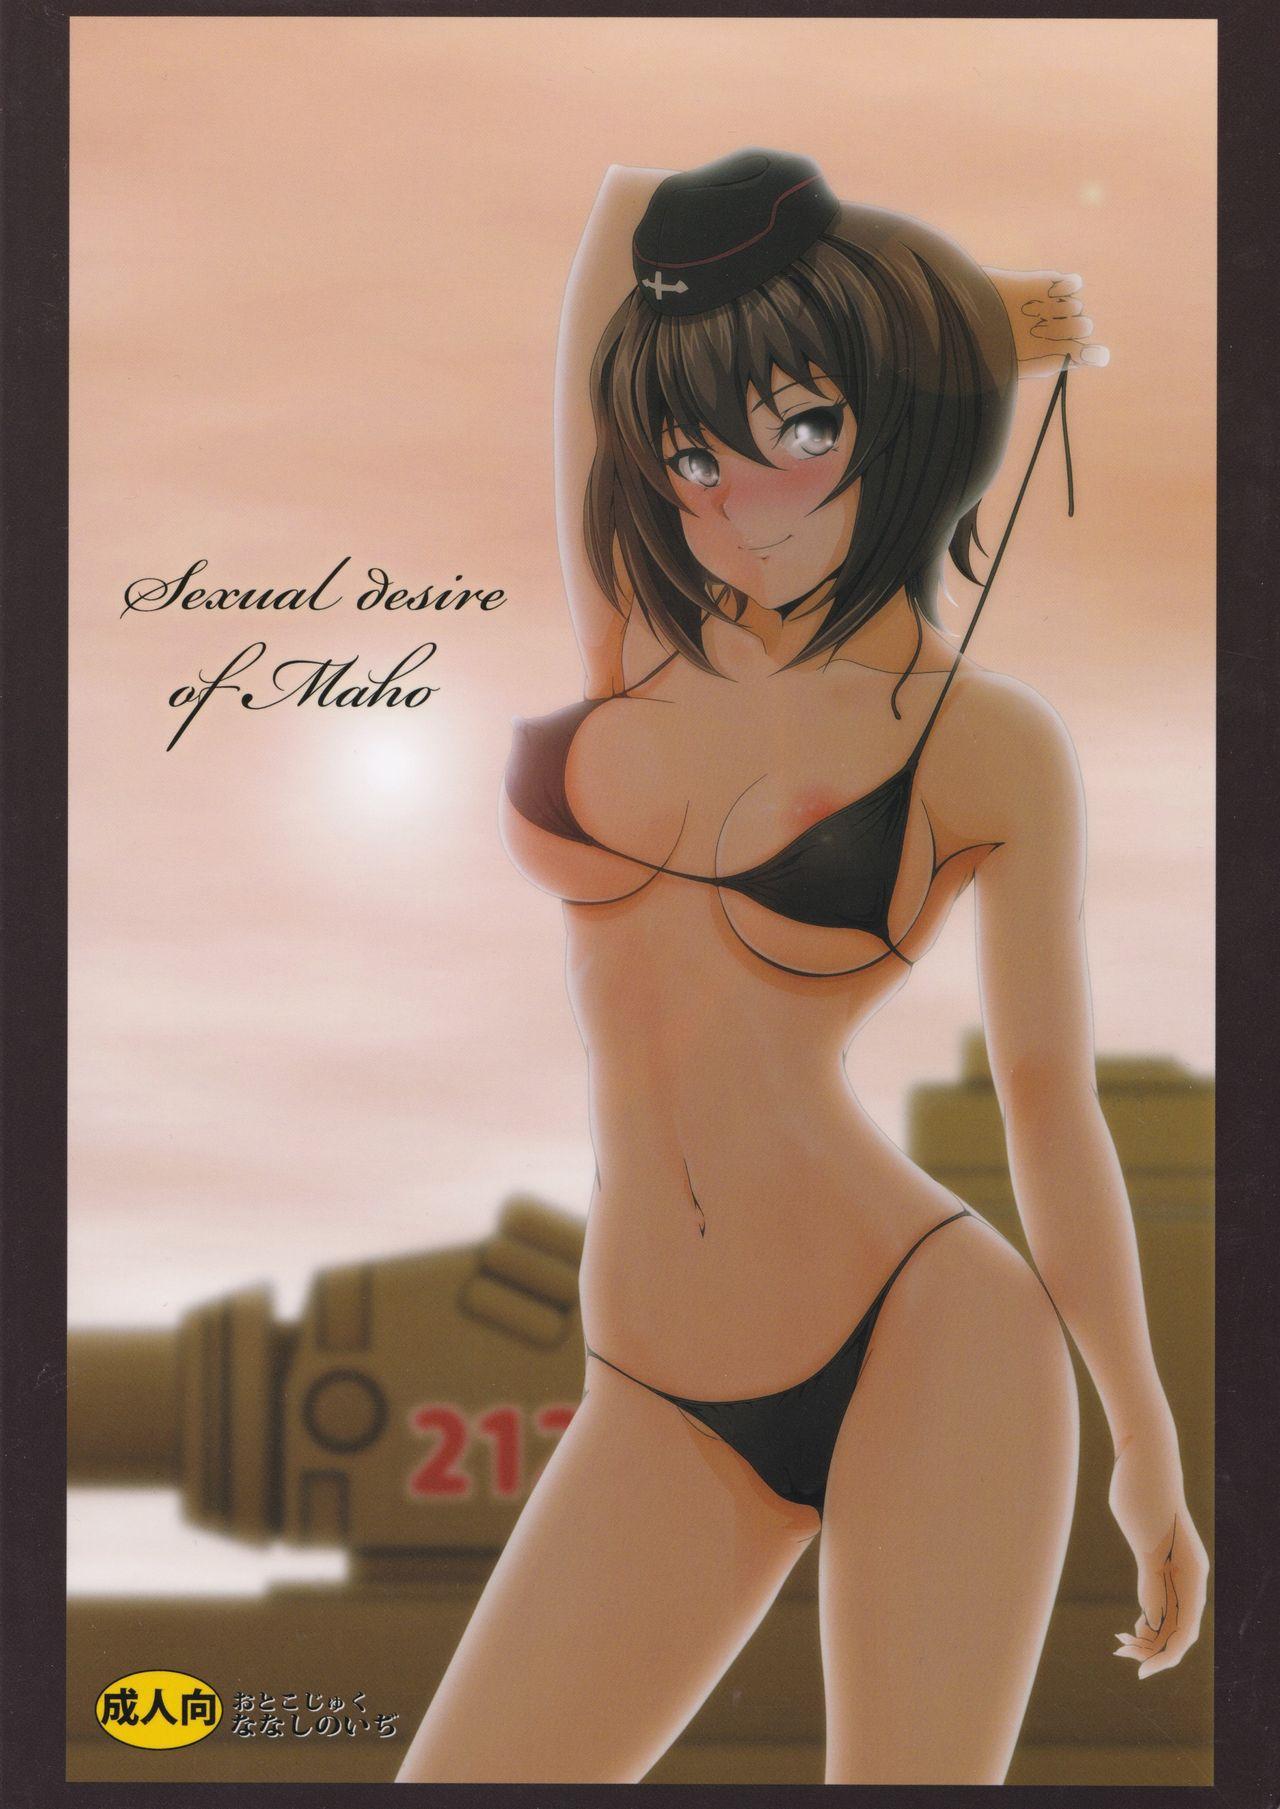 Sexual desire of Maho 37